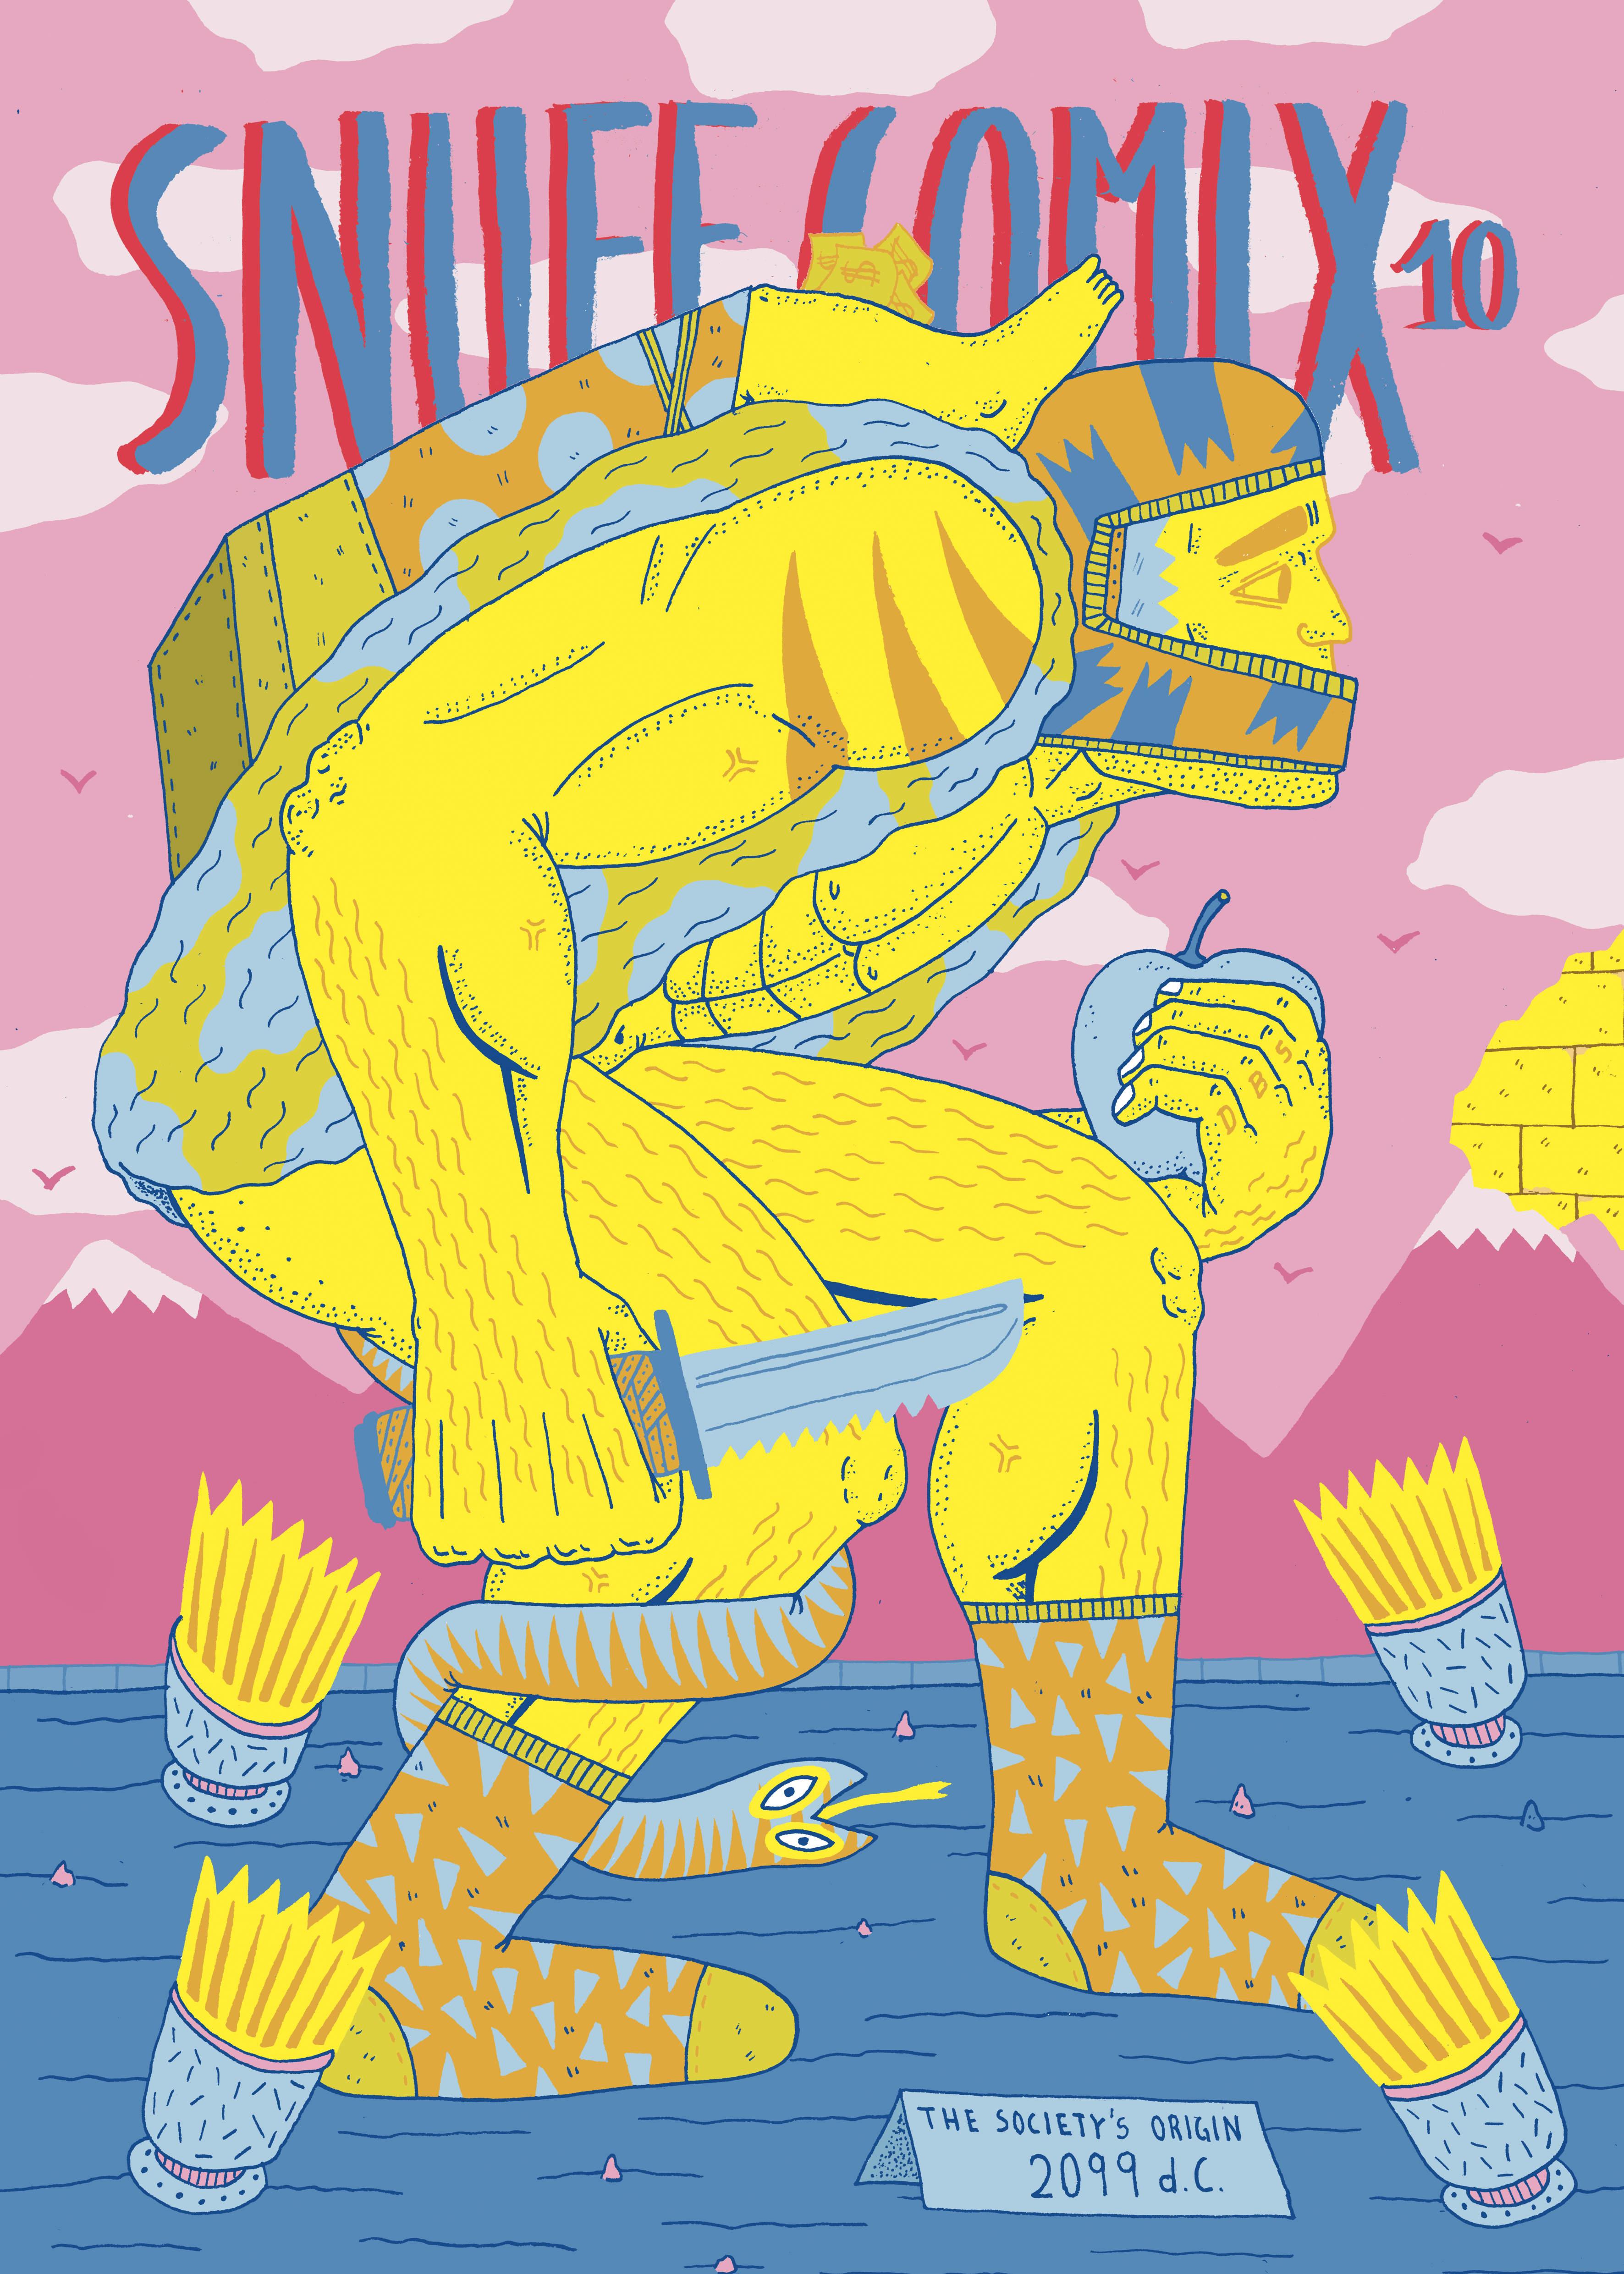 Snuff Comix#910